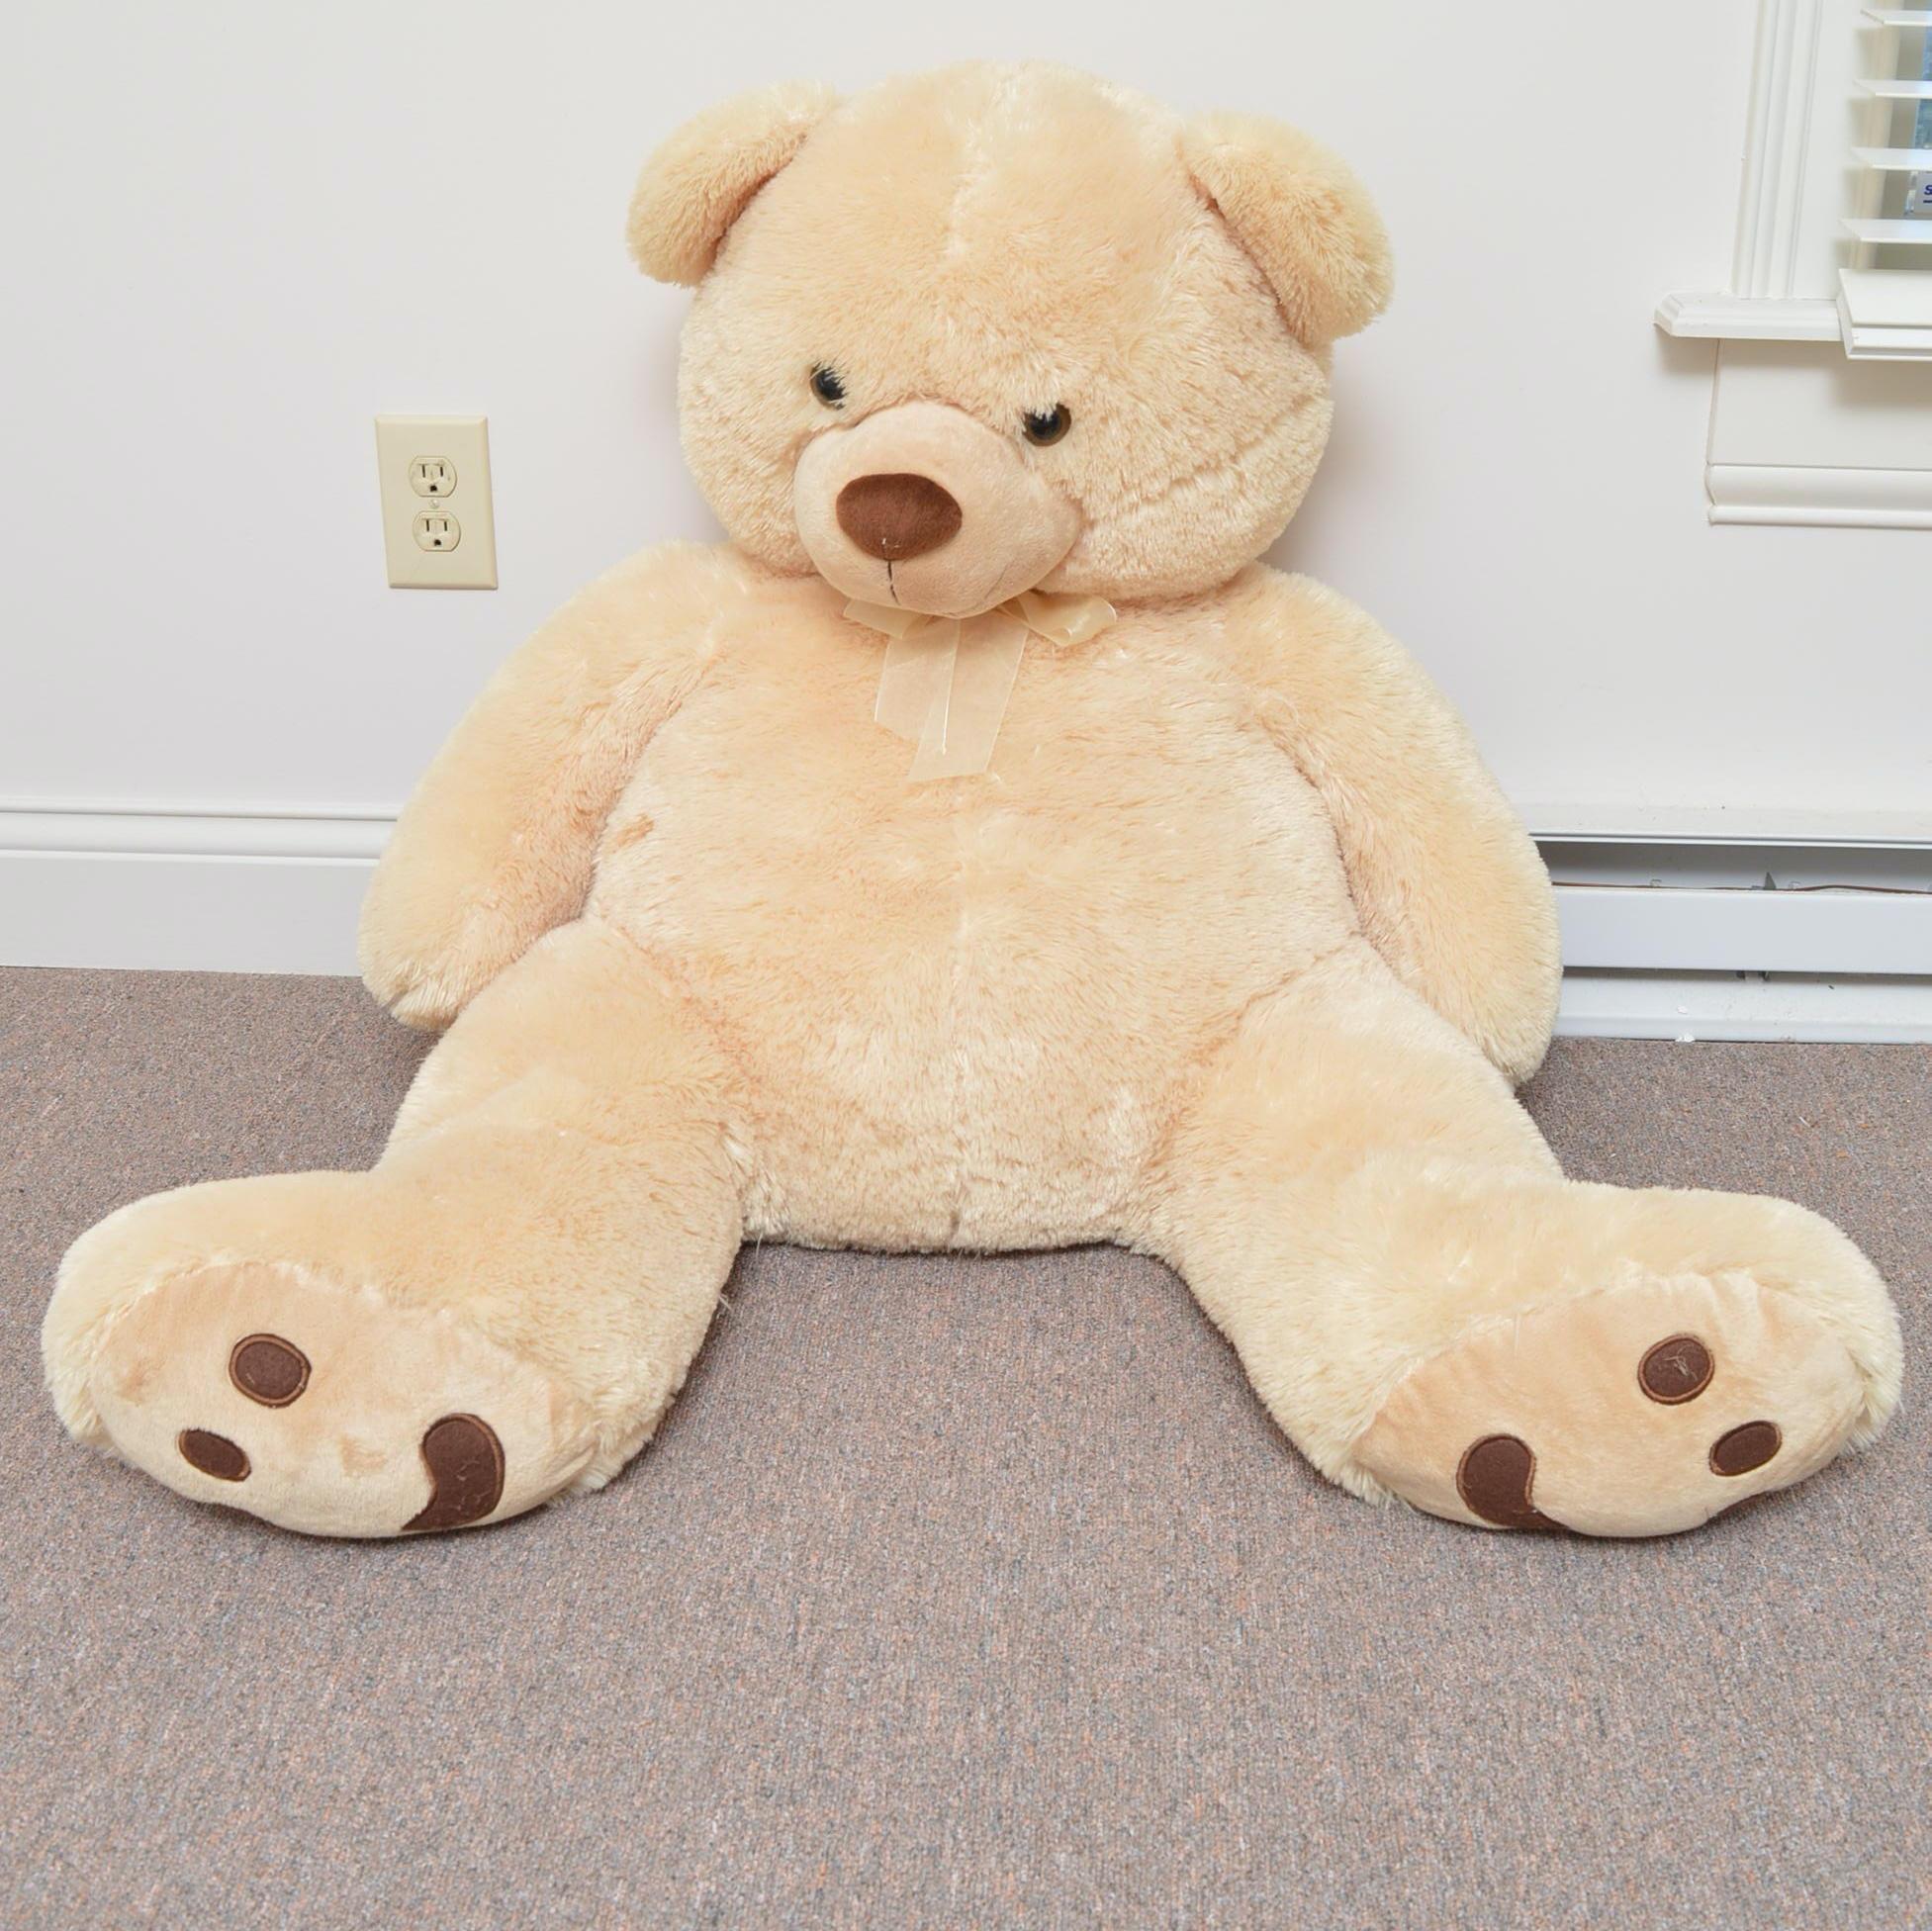 Extra Large Plush Teddy Bear